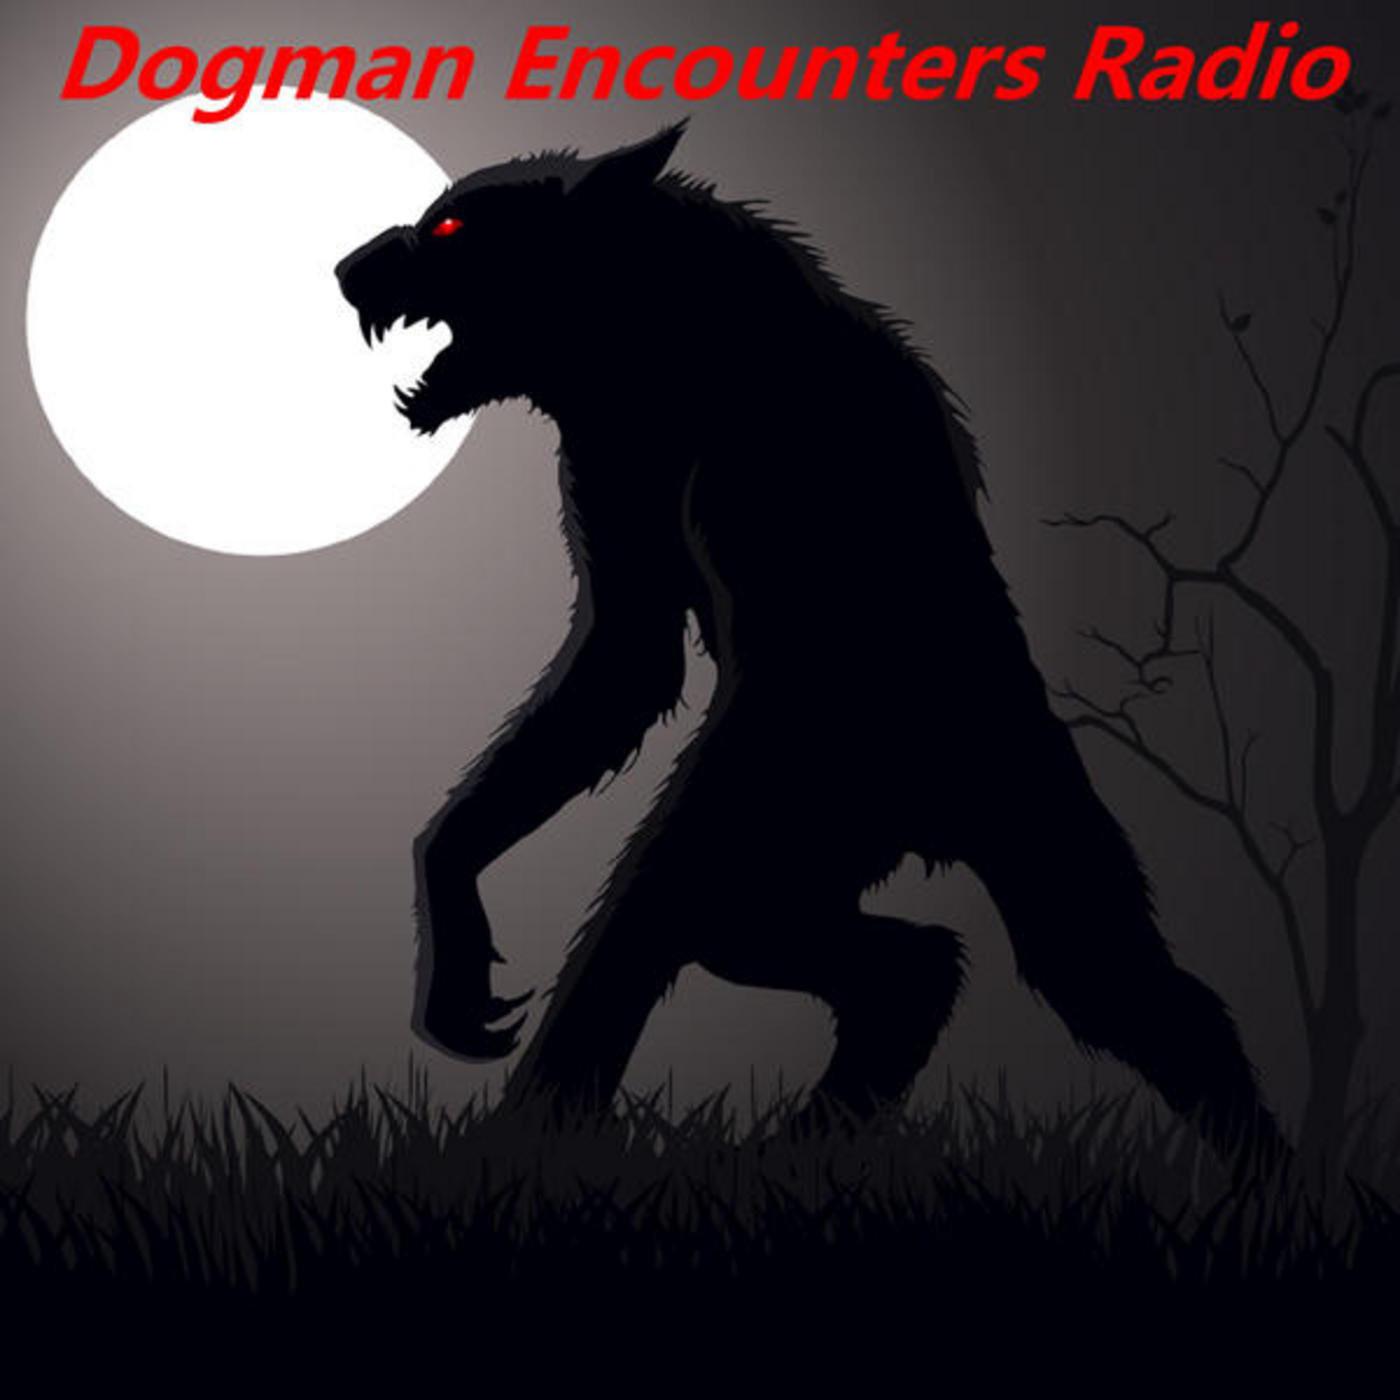 Listen Dogman Encounters Radio - iVoox